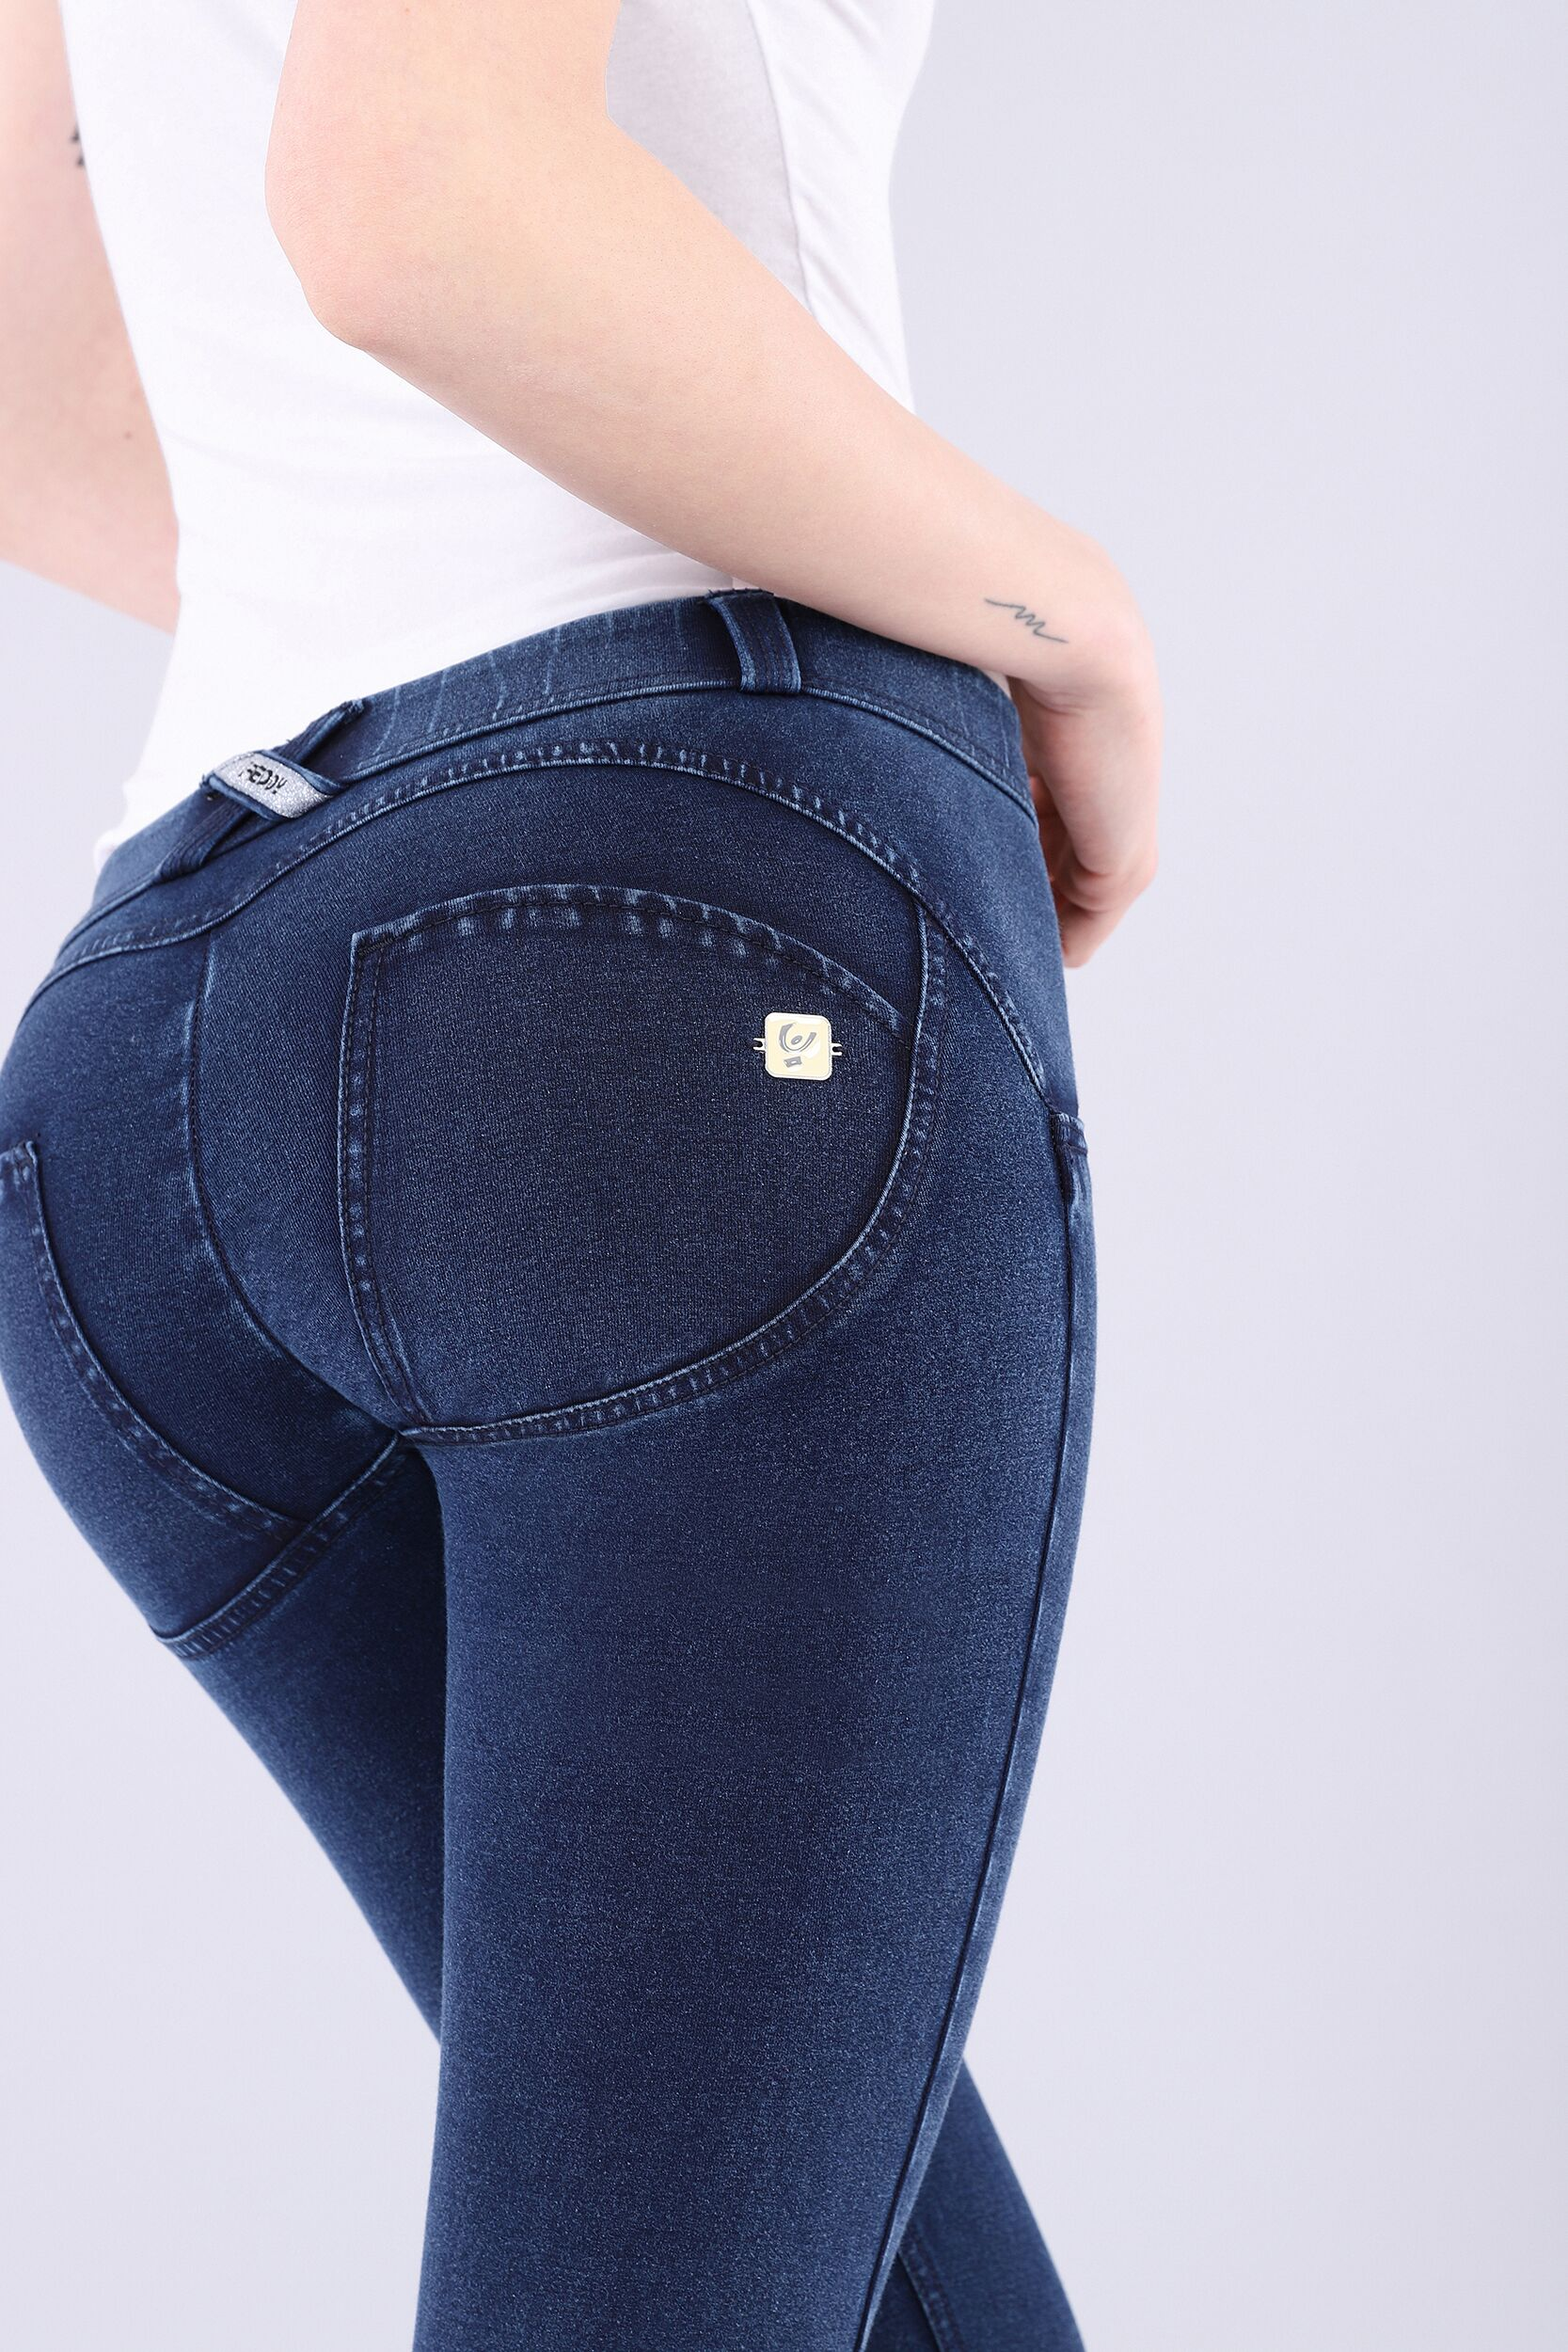 I pantaloni push up funzionano davvero?